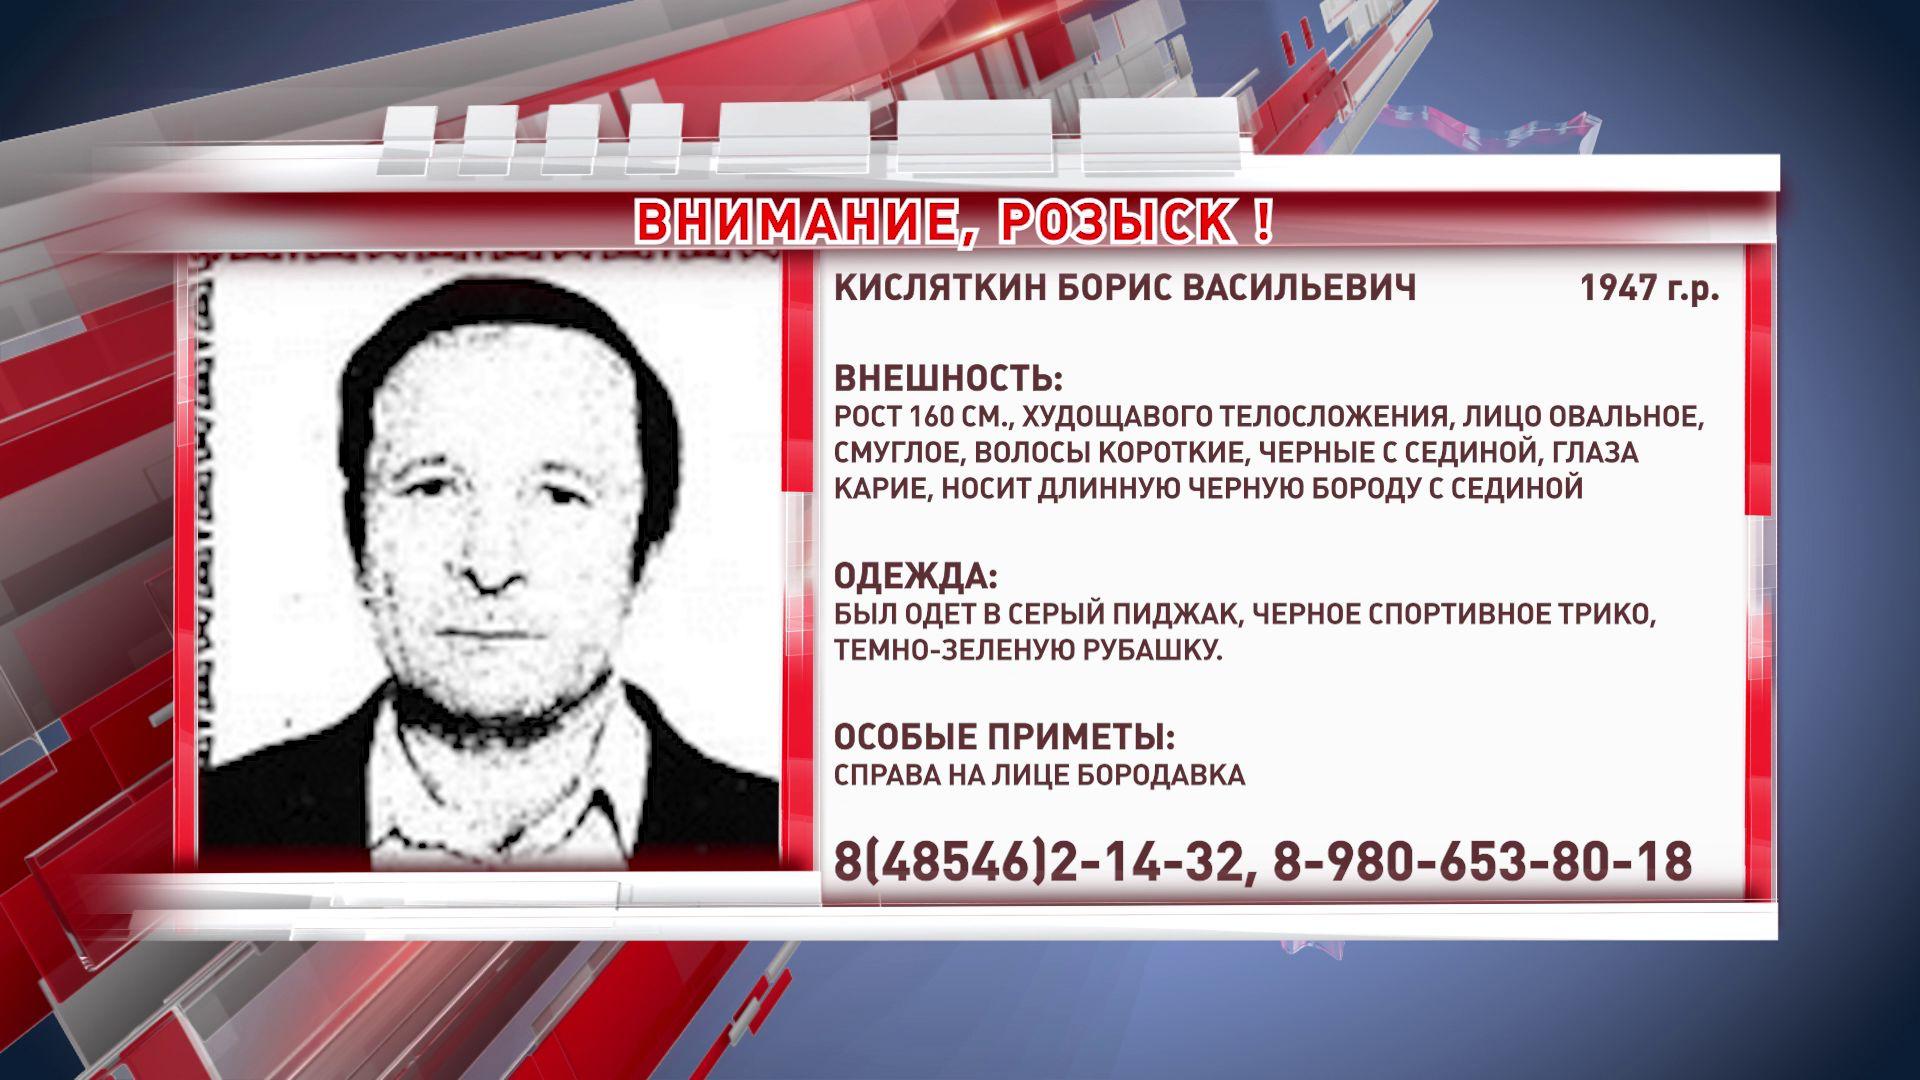 В Ярославле пропал 73-летний мужчина